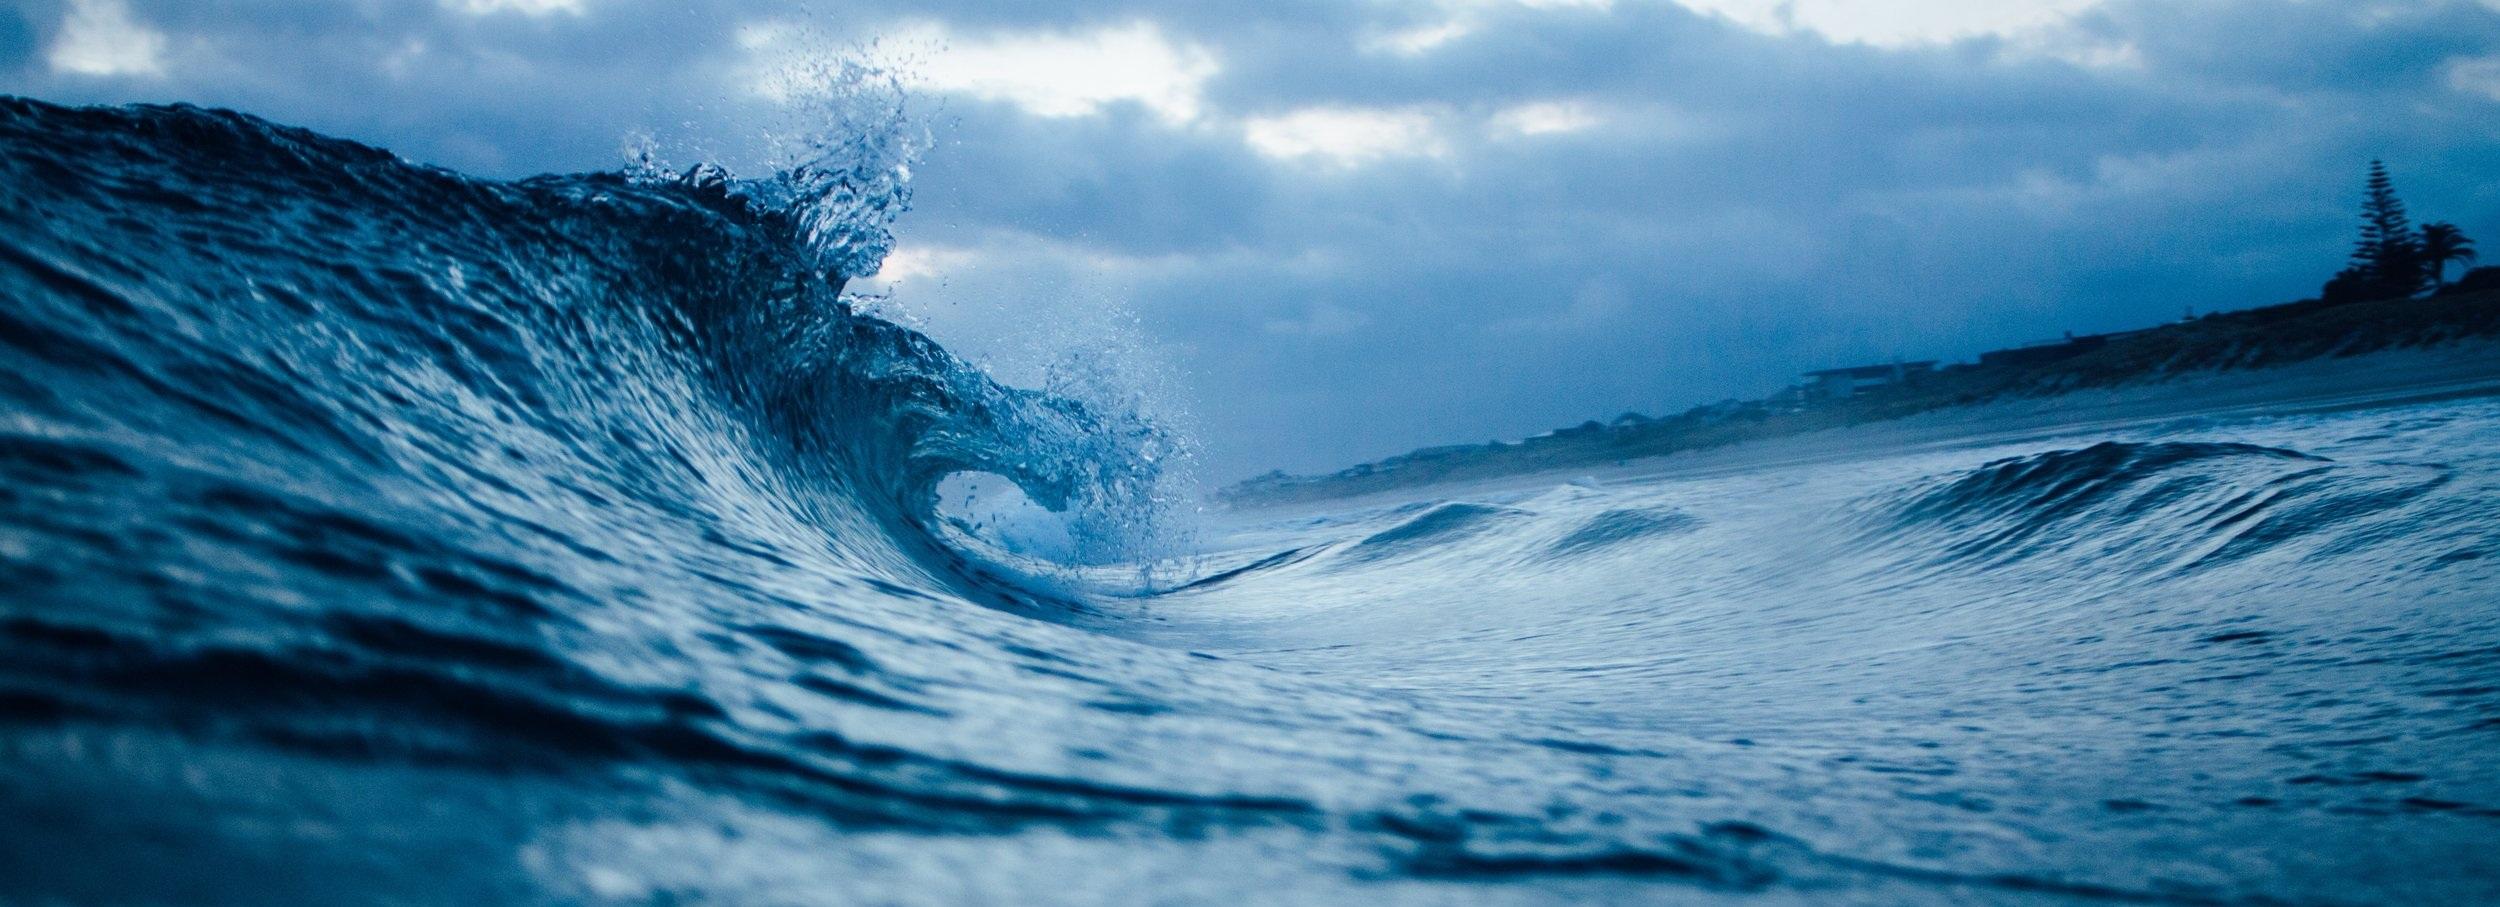 Waves photo by Tim Marshall, Unsplash